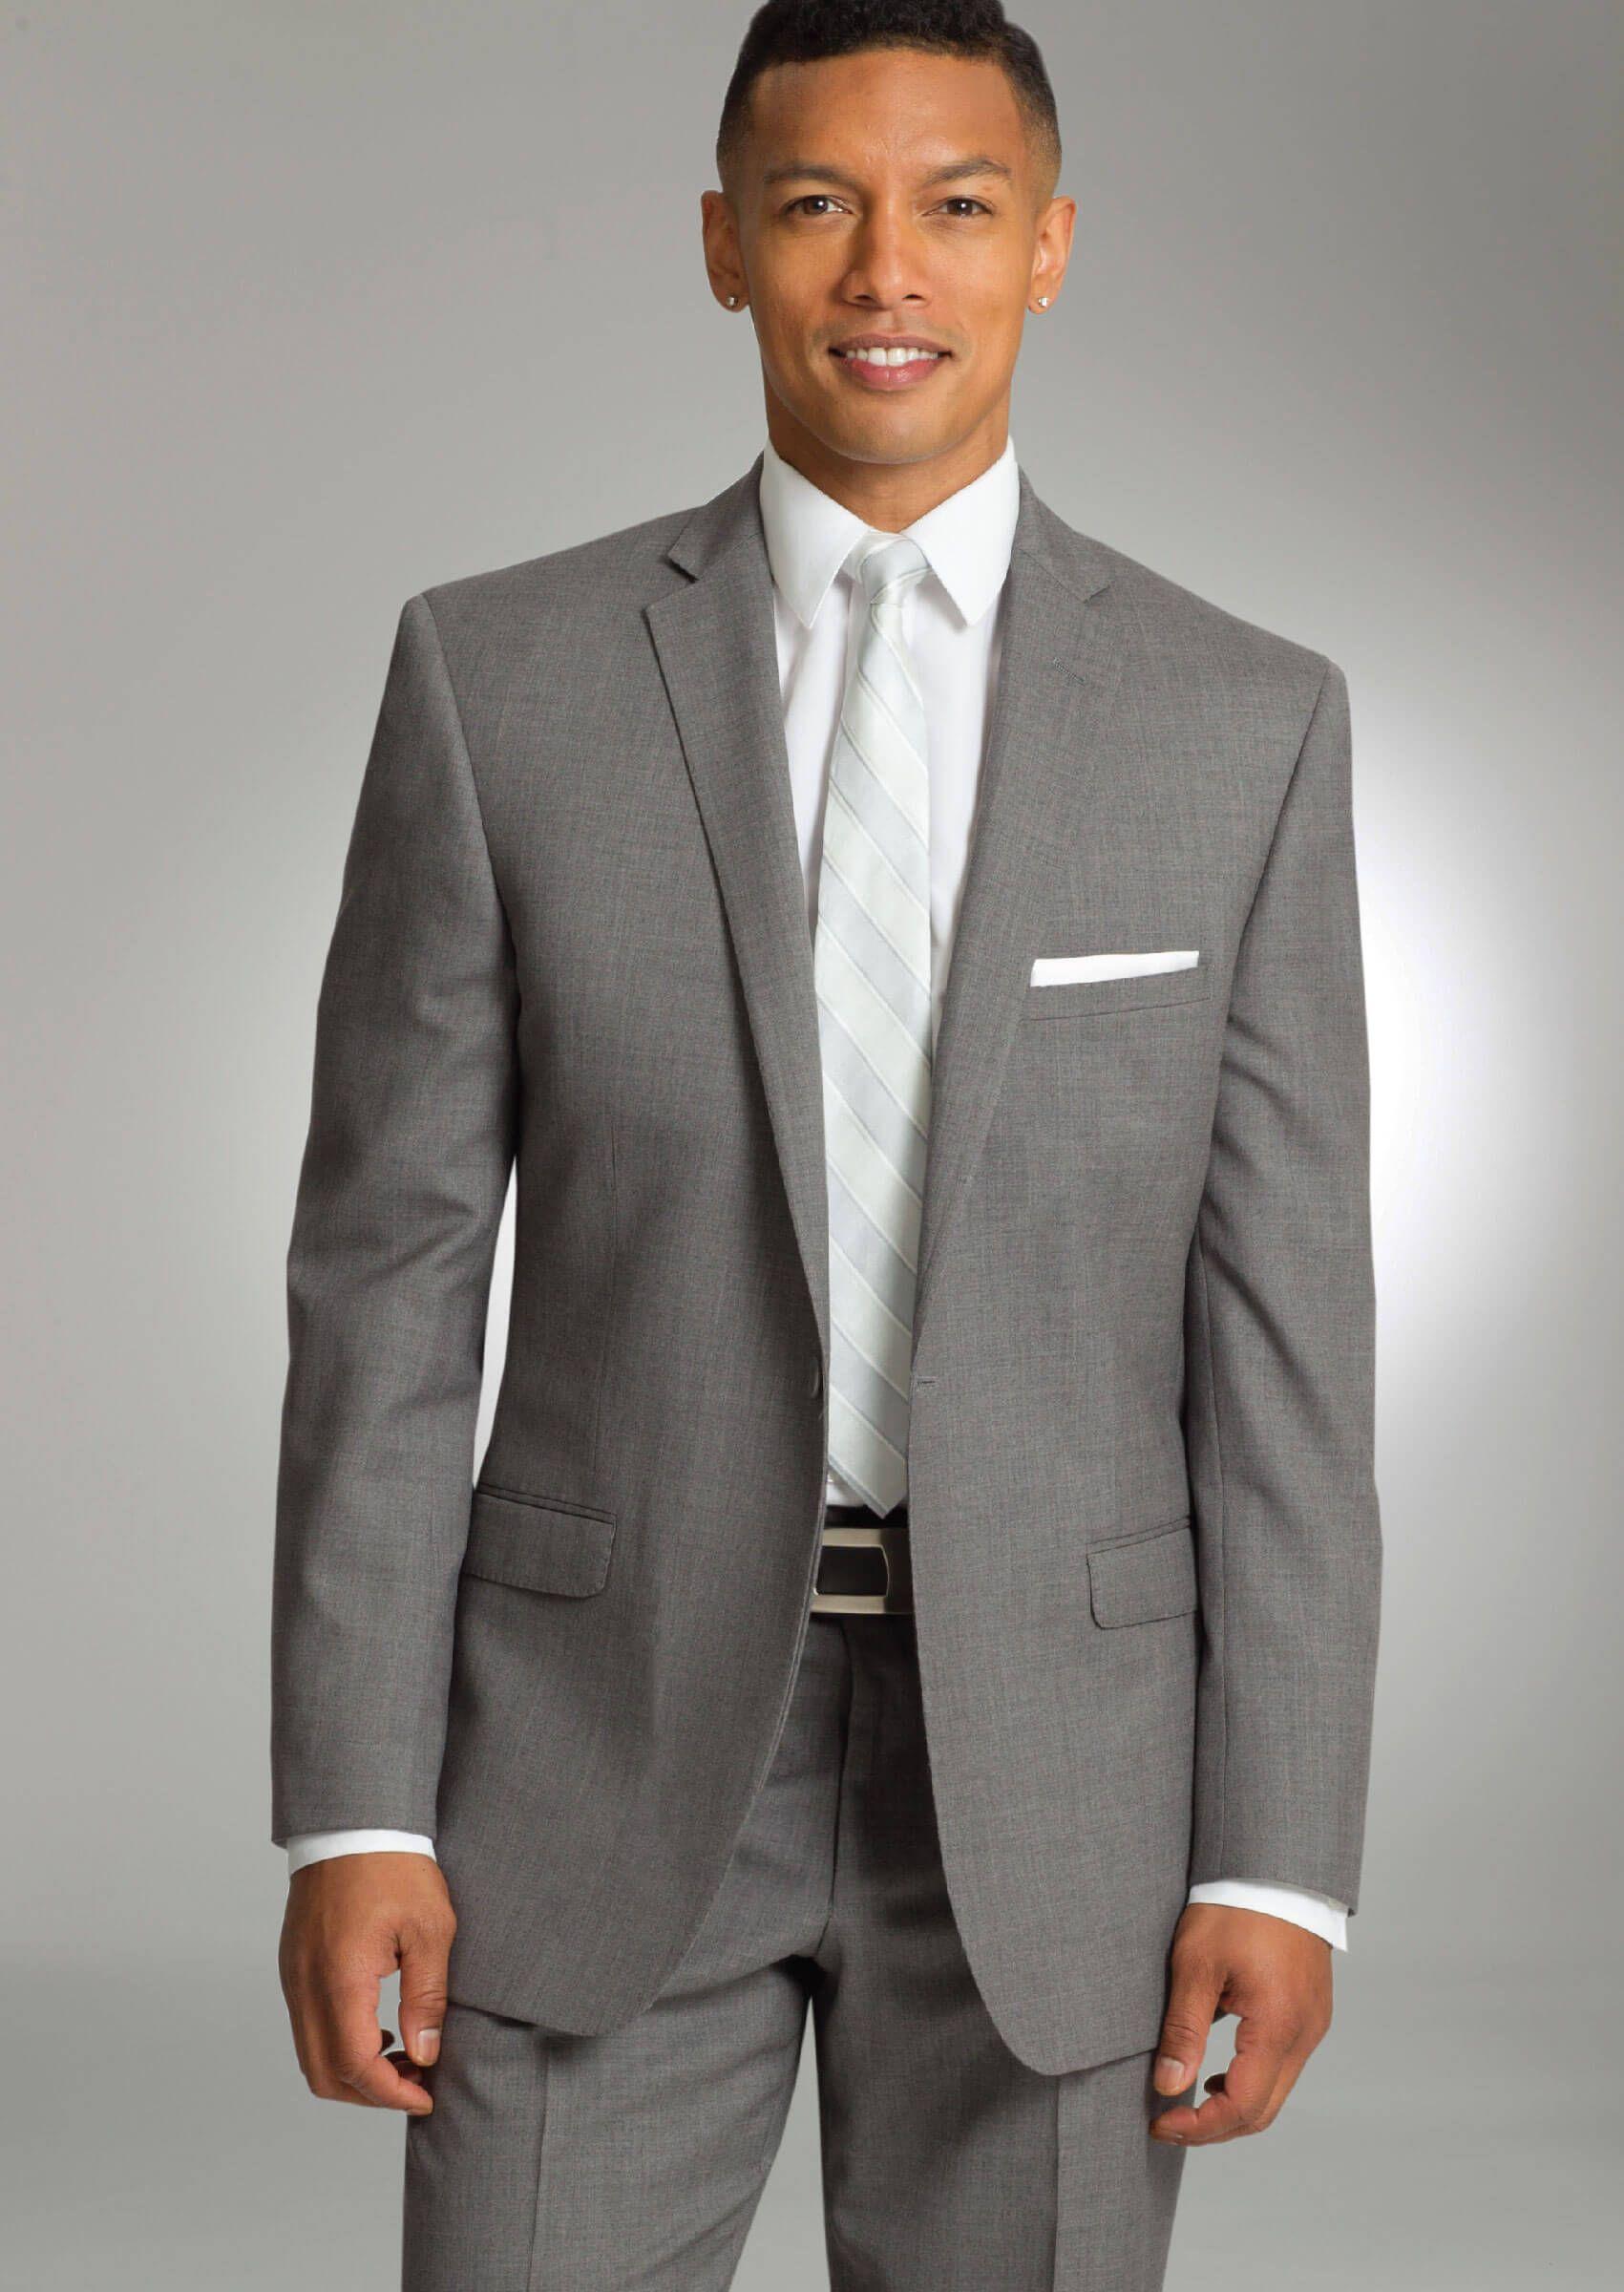 Grey Valencia One Button Notch Dress Suit by Savvi   SARNO / SAAVI ...